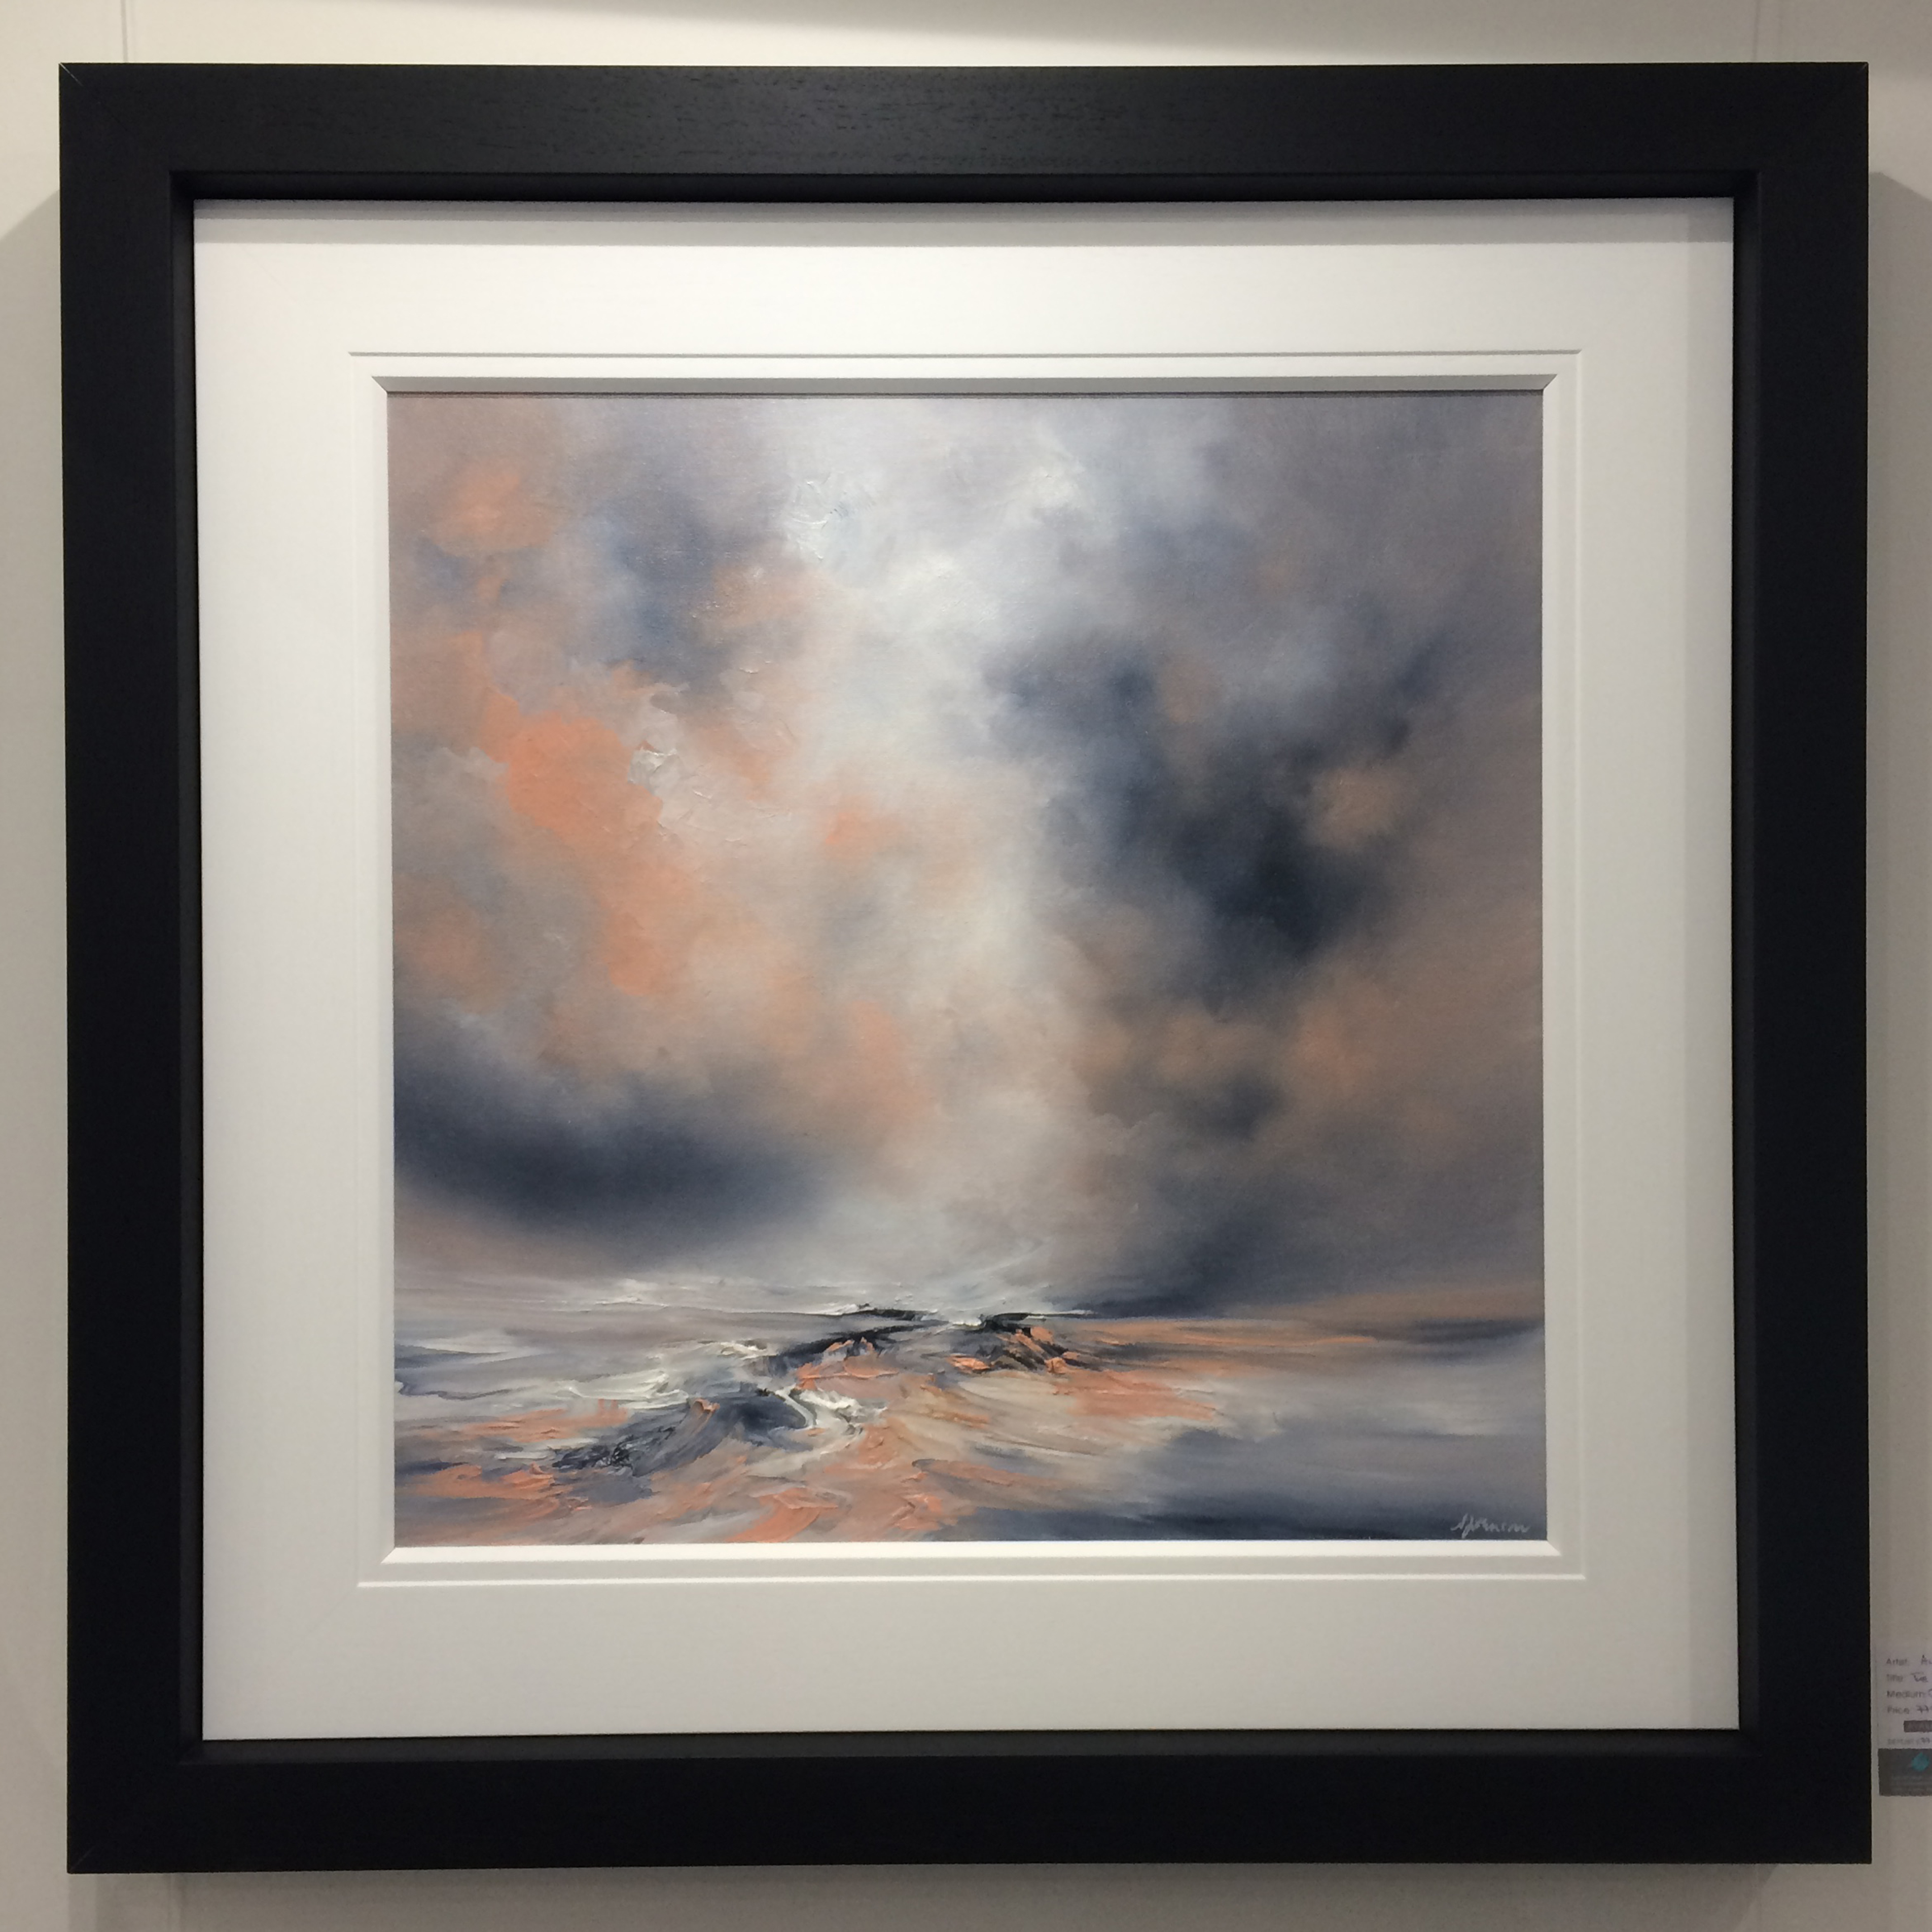 The Light Burst by Alison Johnson